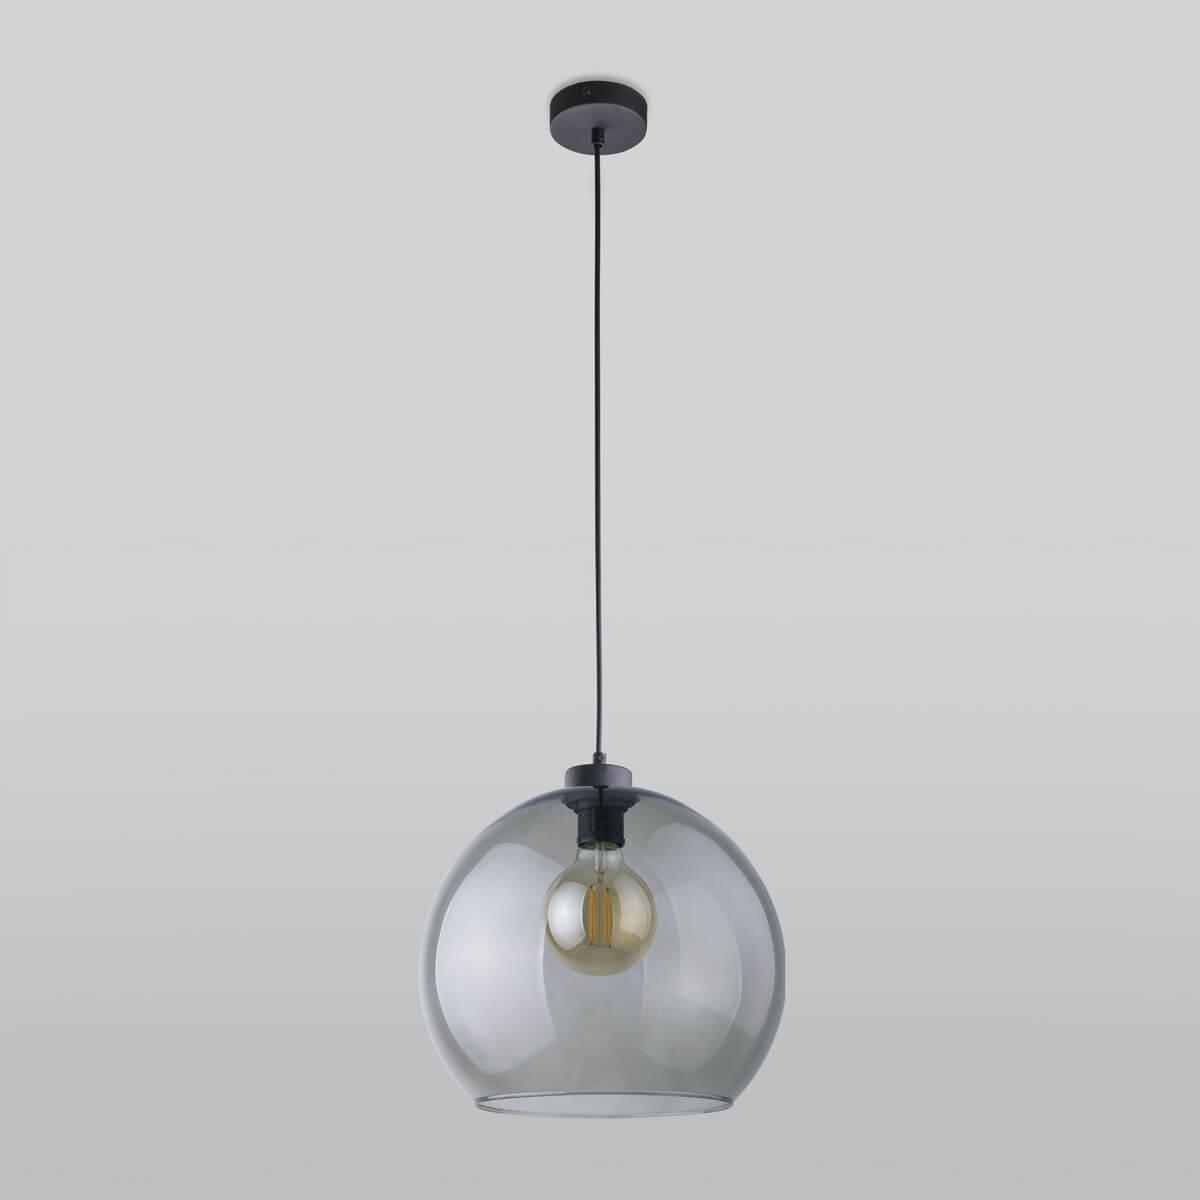 Светильник TK Lighting 4292 Cubus Graphite Cubus Graphite